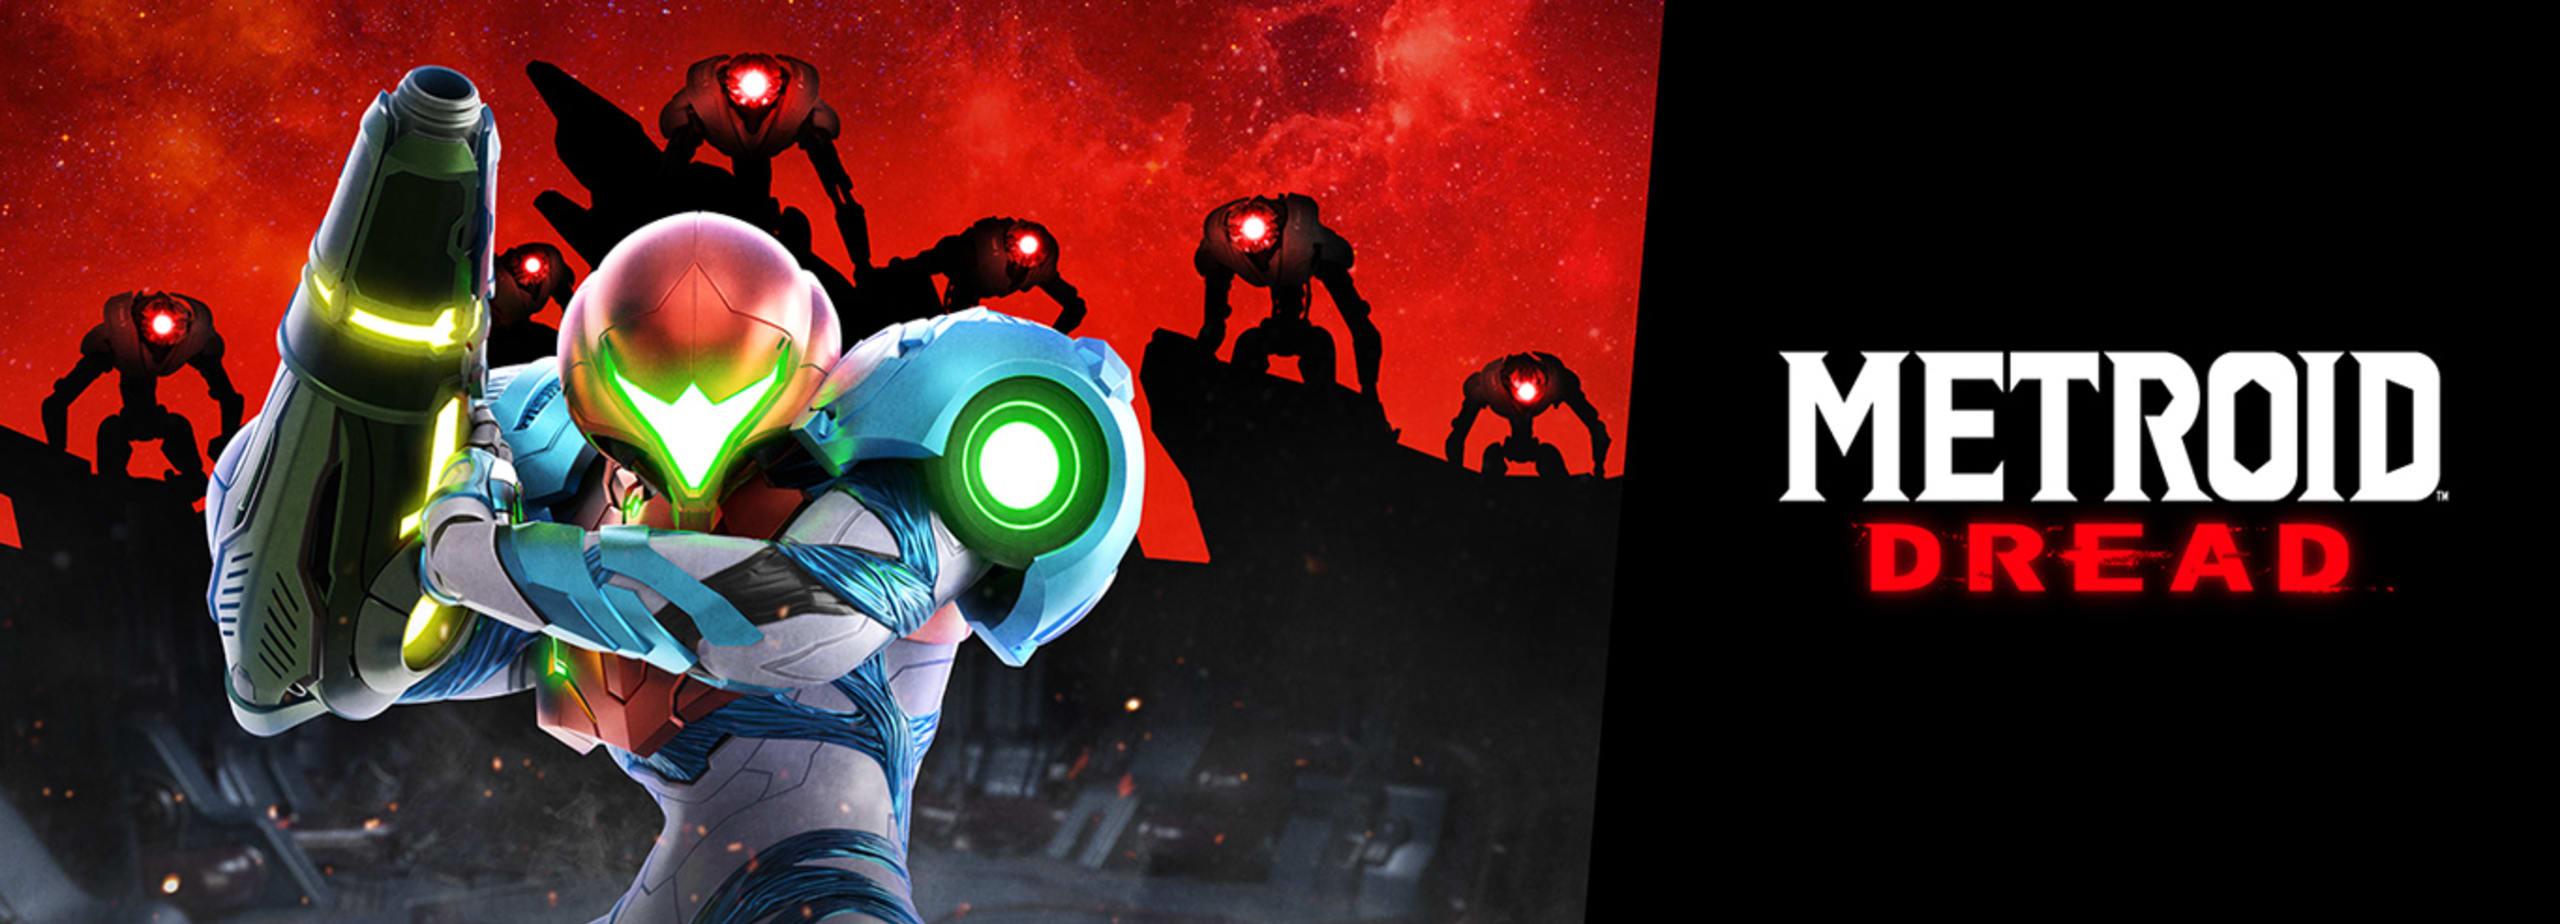 Metroid Dread - Já disponível